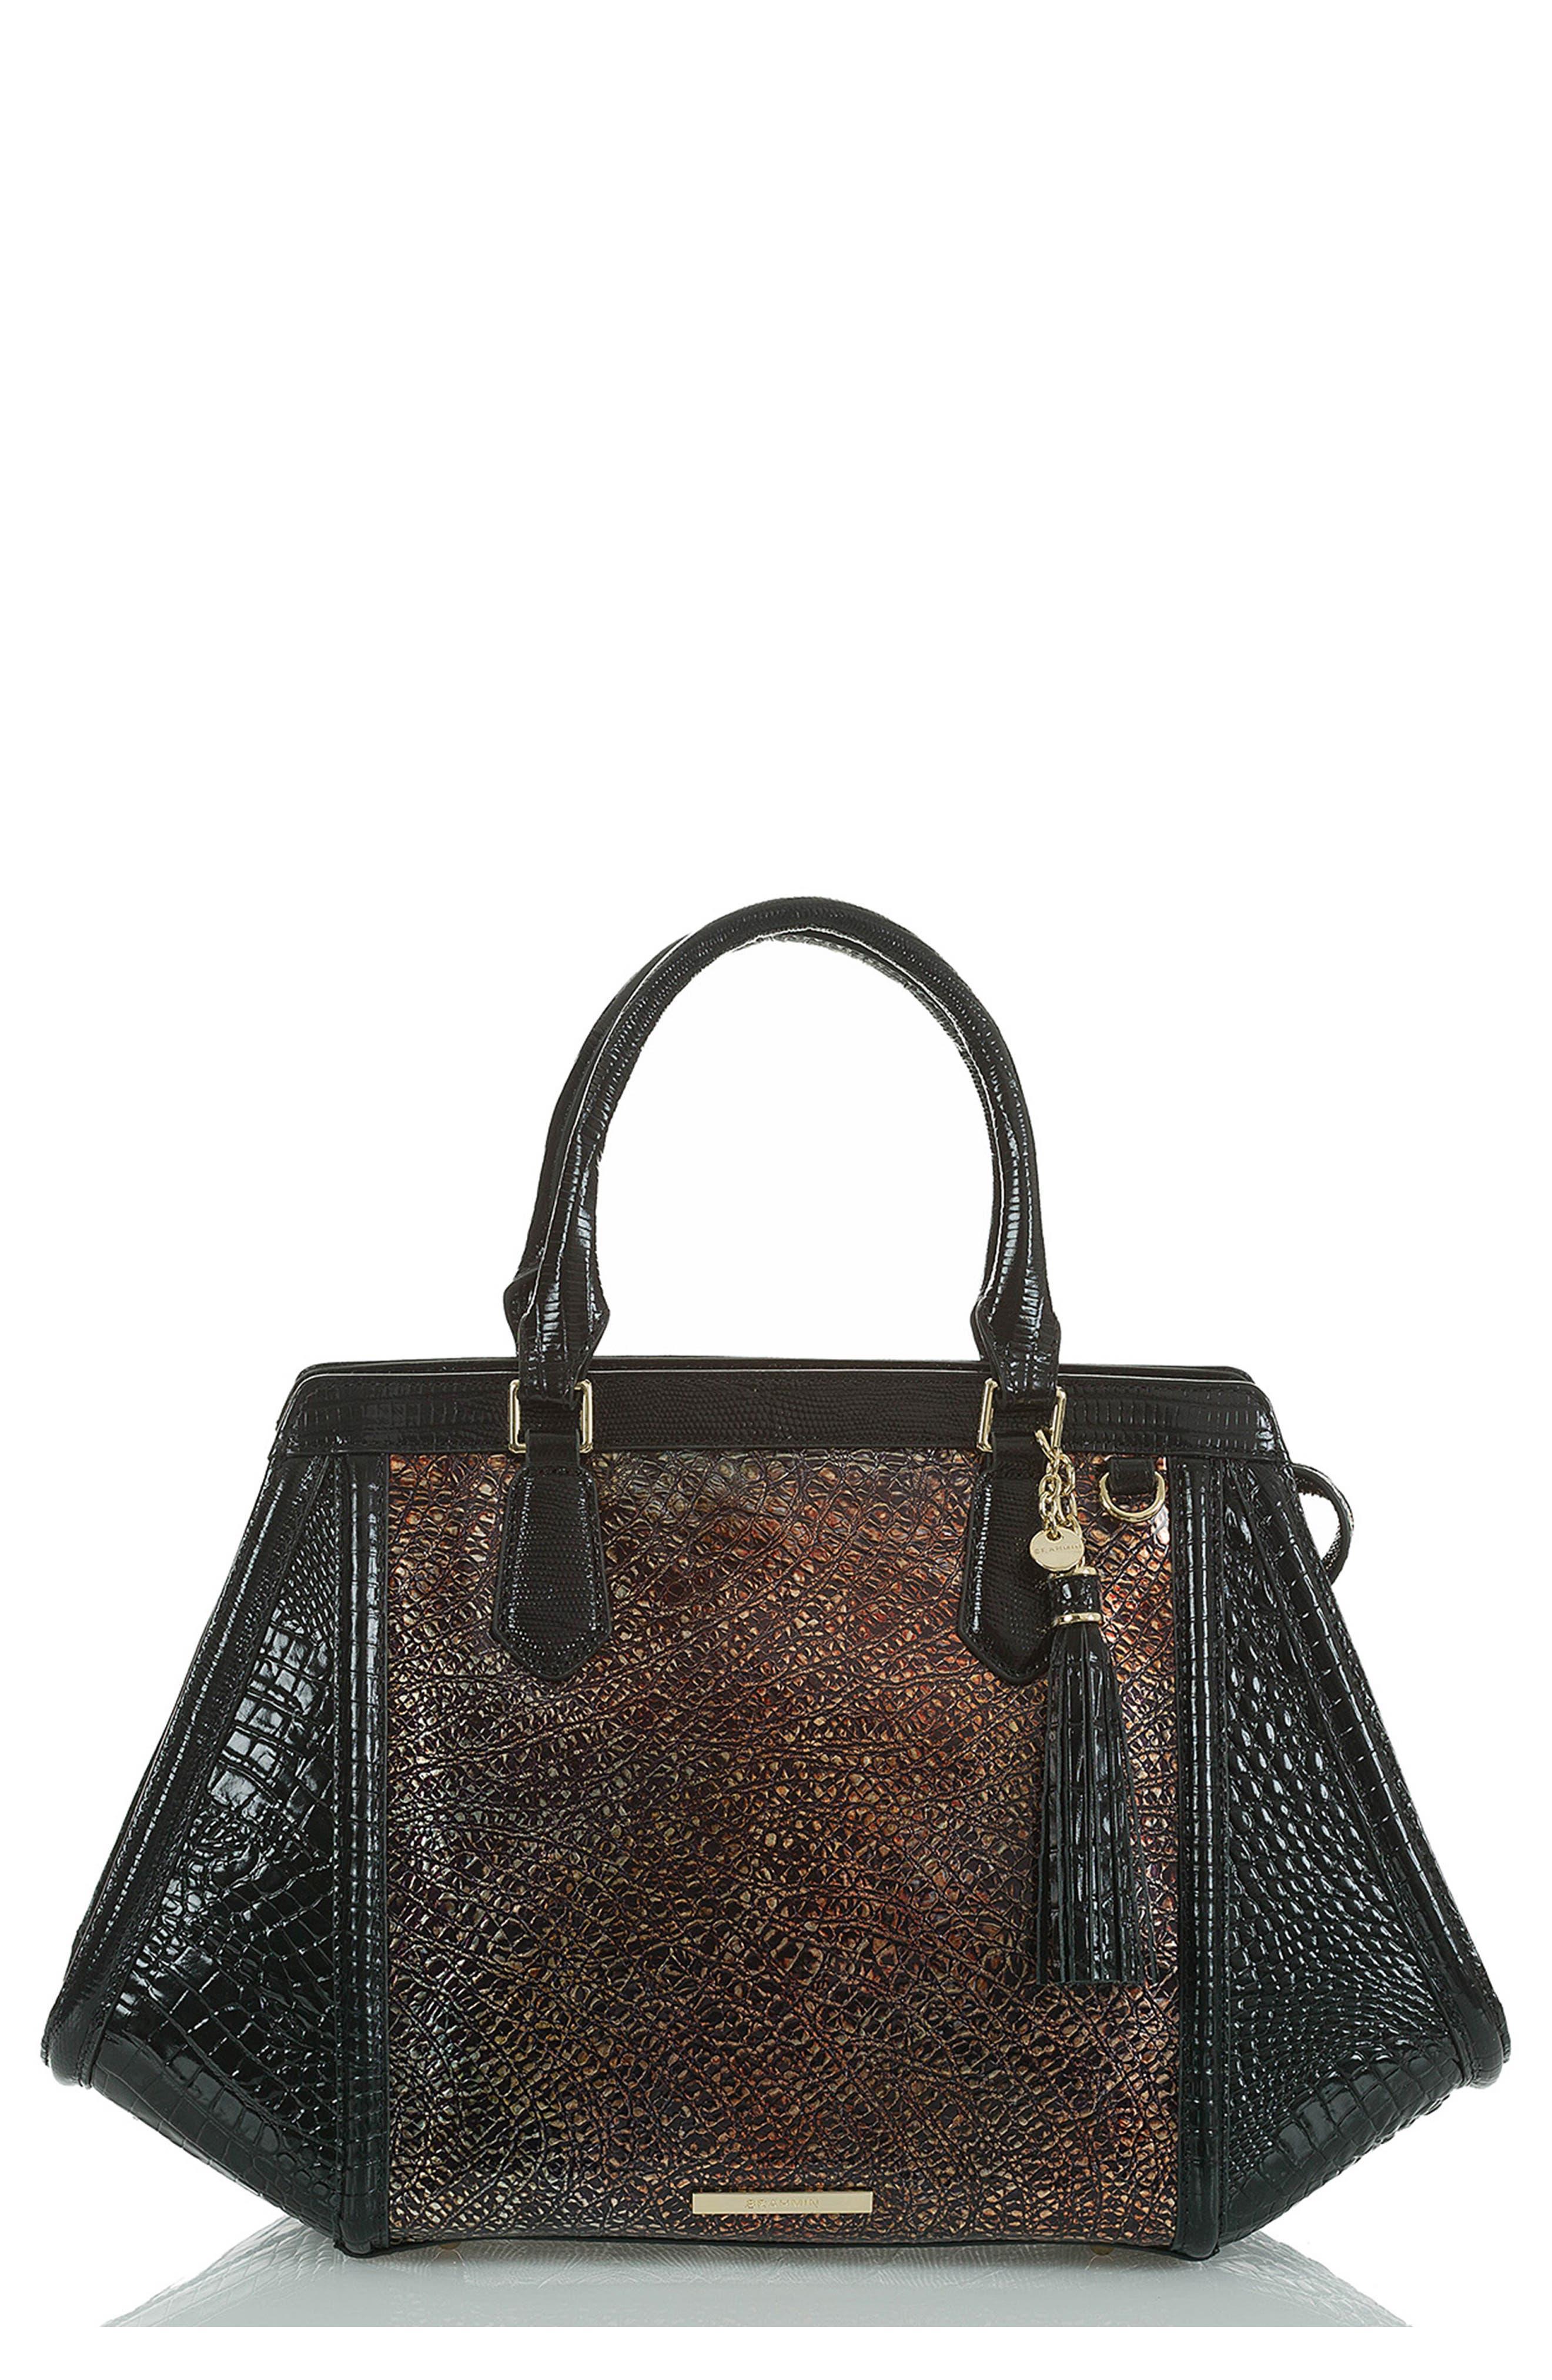 0c141edb77 Brahmin Arden Embossed Leather Satchel - Black